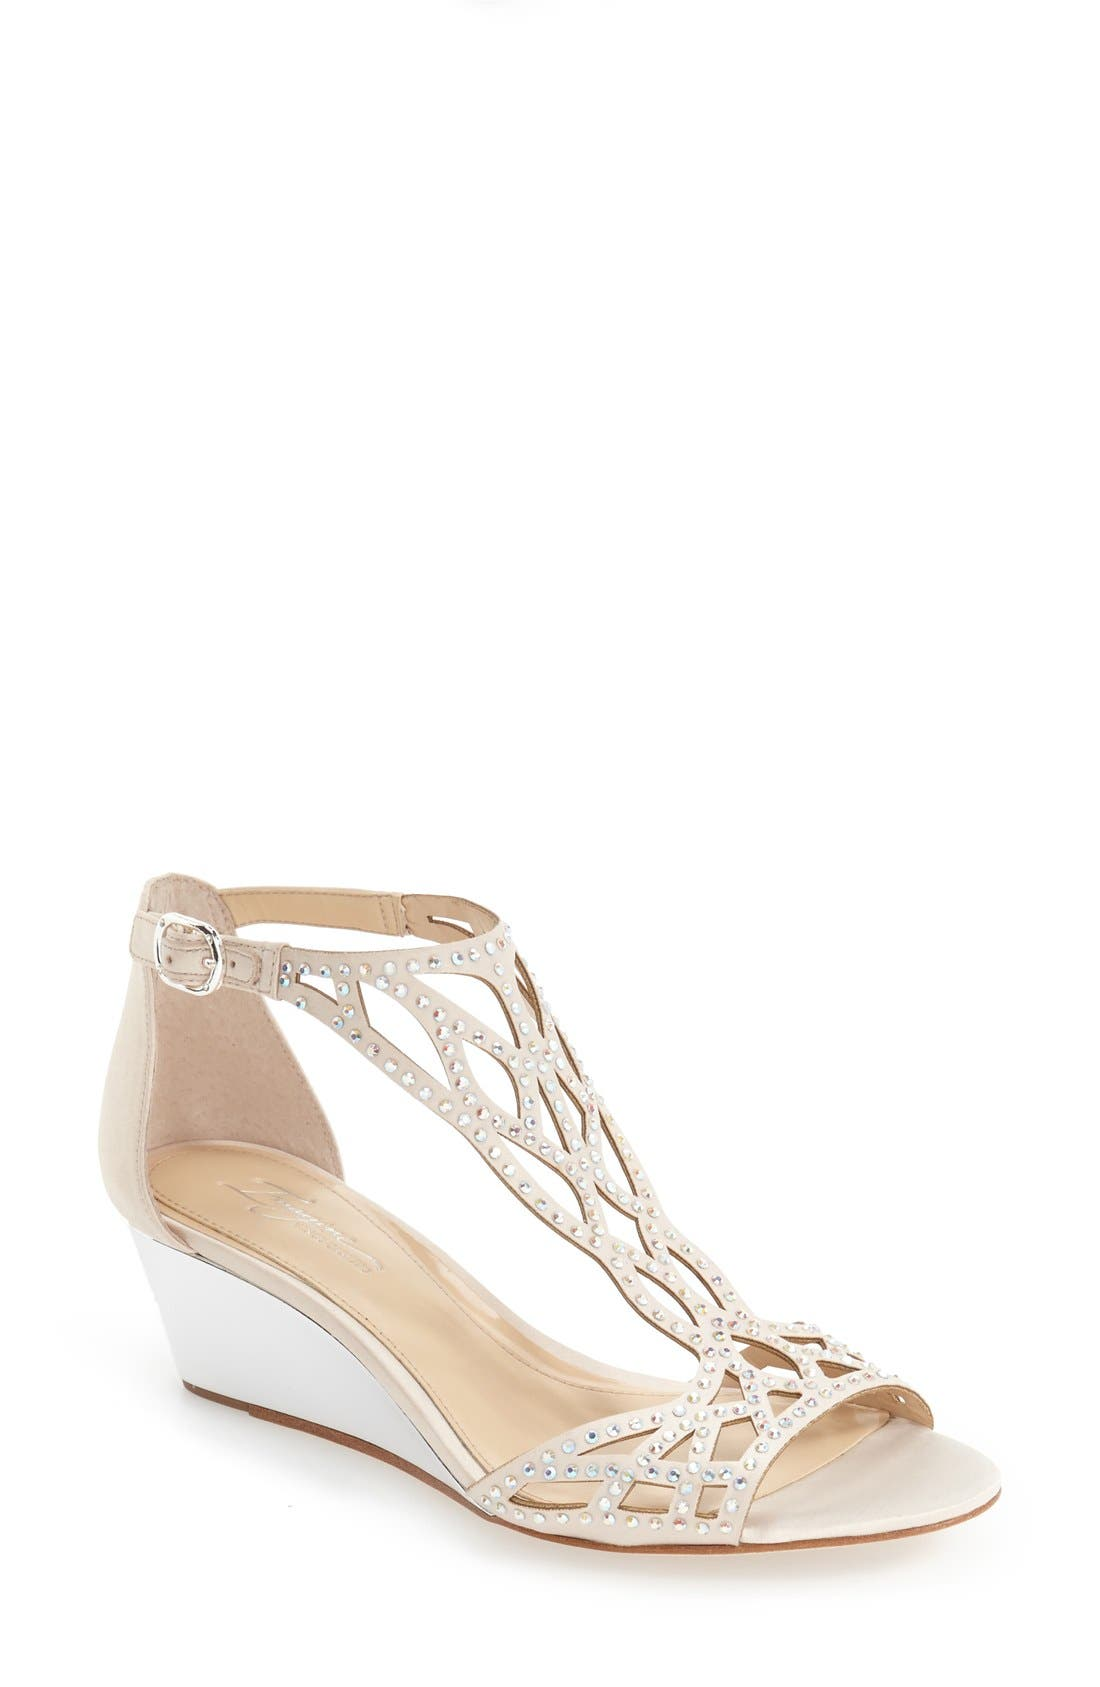 IMAGINE BY VINCE CAMUTO 'Jalen' Wedge Sandal